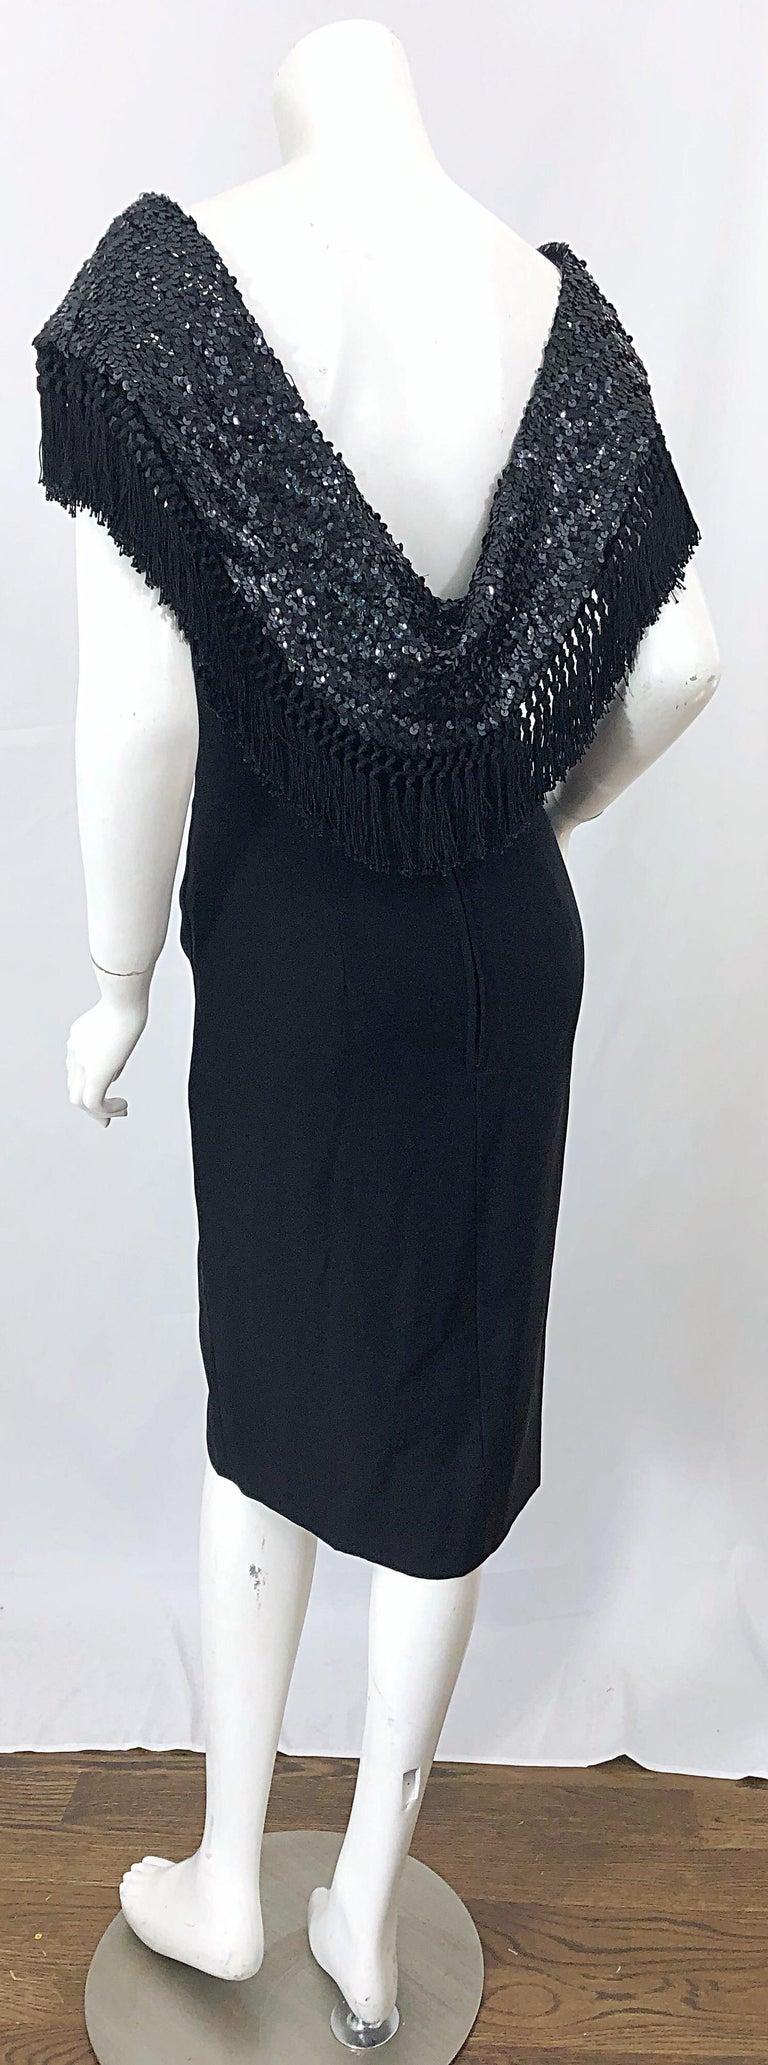 1950s Demi Couture Black Silk Crepe Dramatic Sequin Neck Fringe Vintage Dress For Sale 4